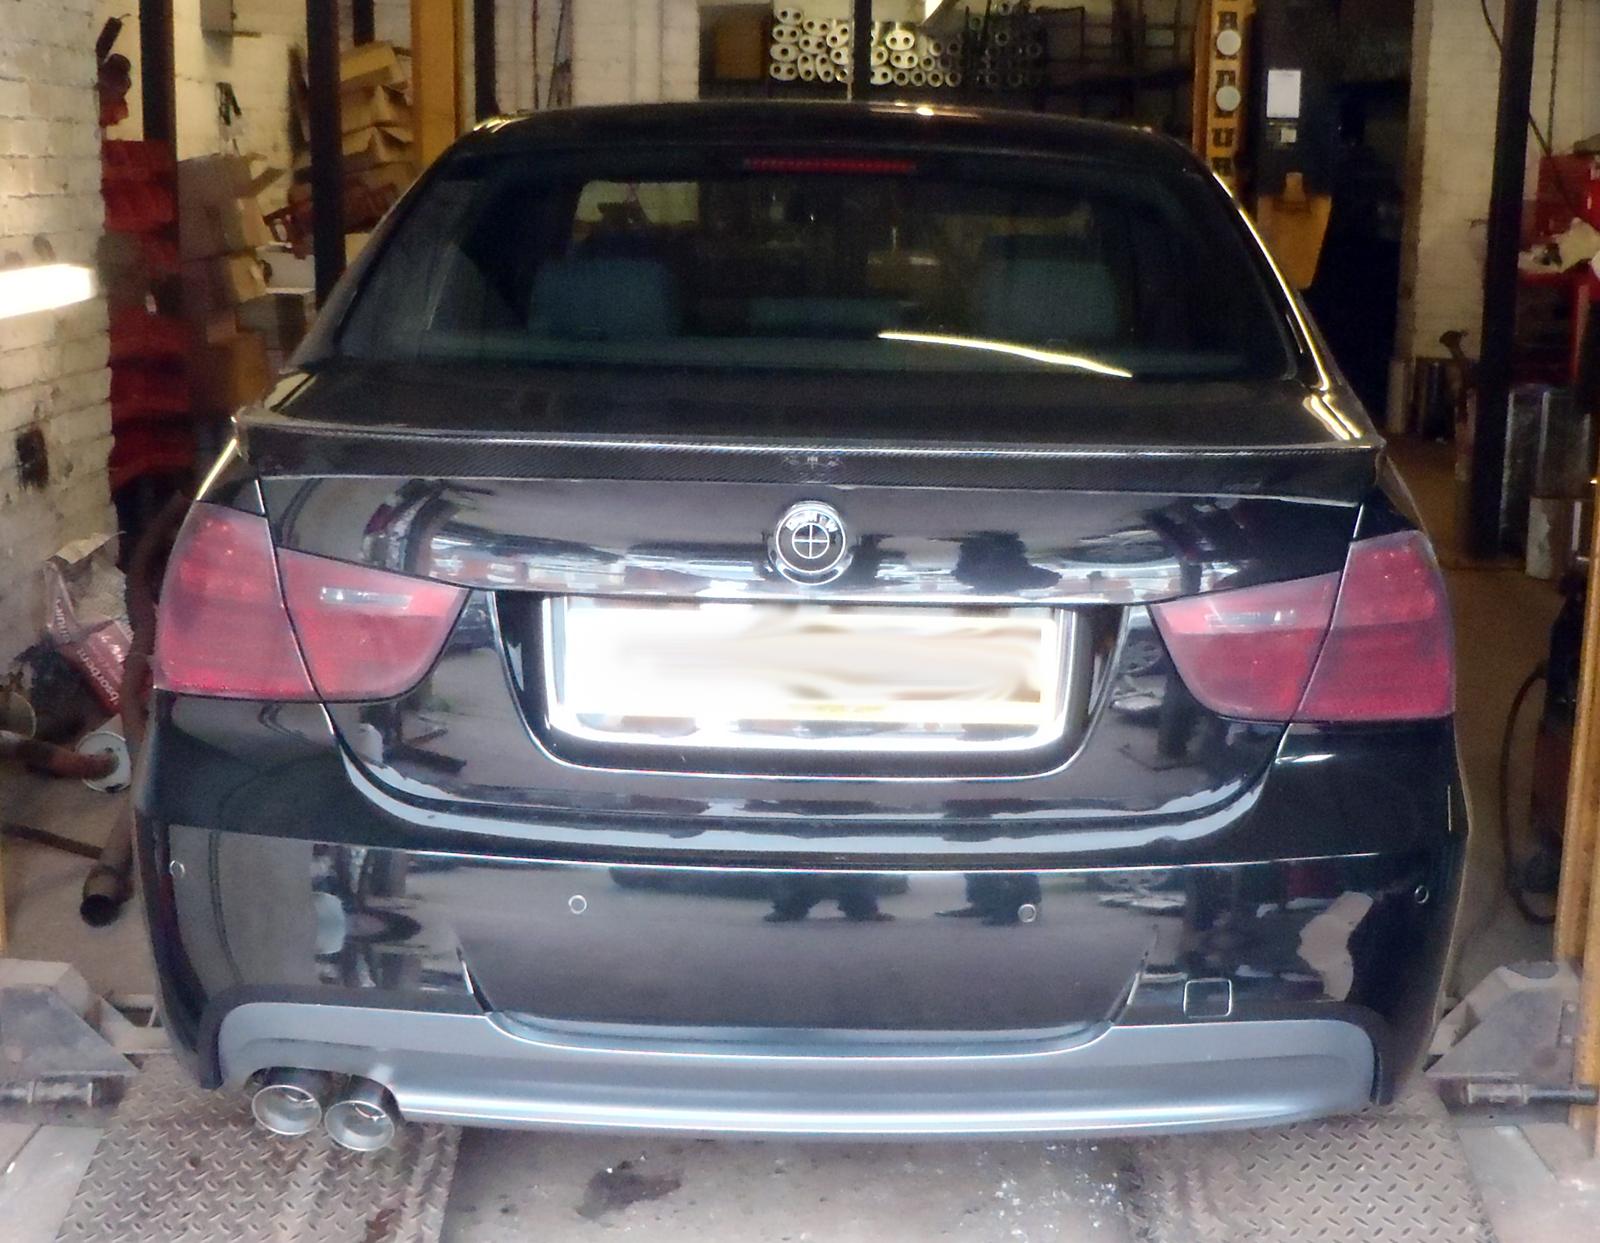 BMW 320d rear silencer delete